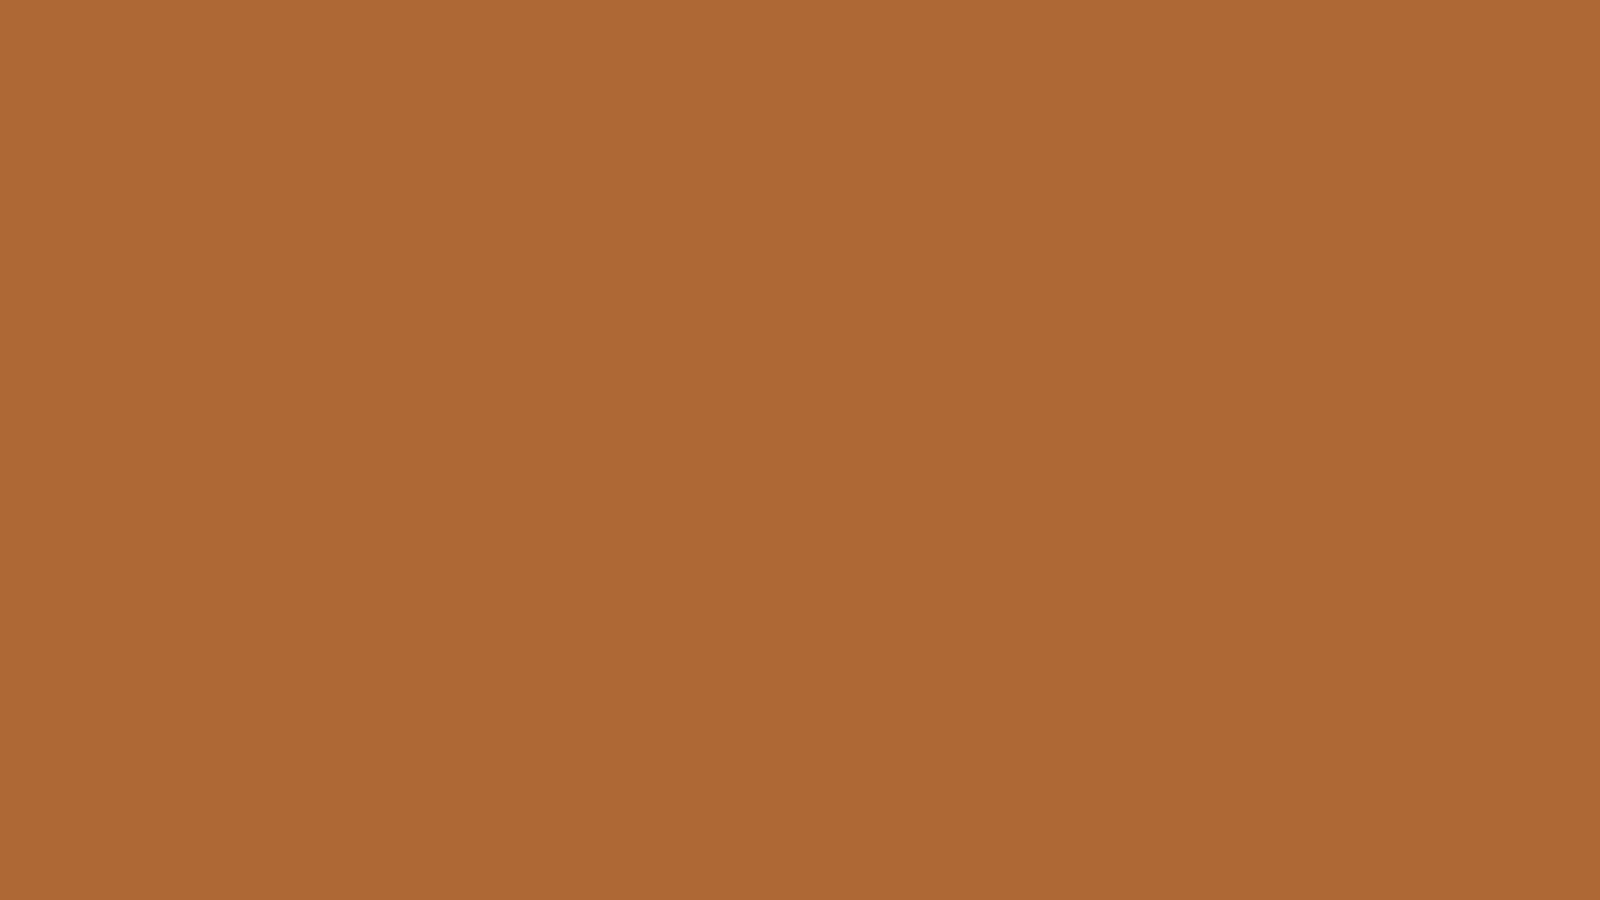 1600x900 Windsor Tan Solid Color Background